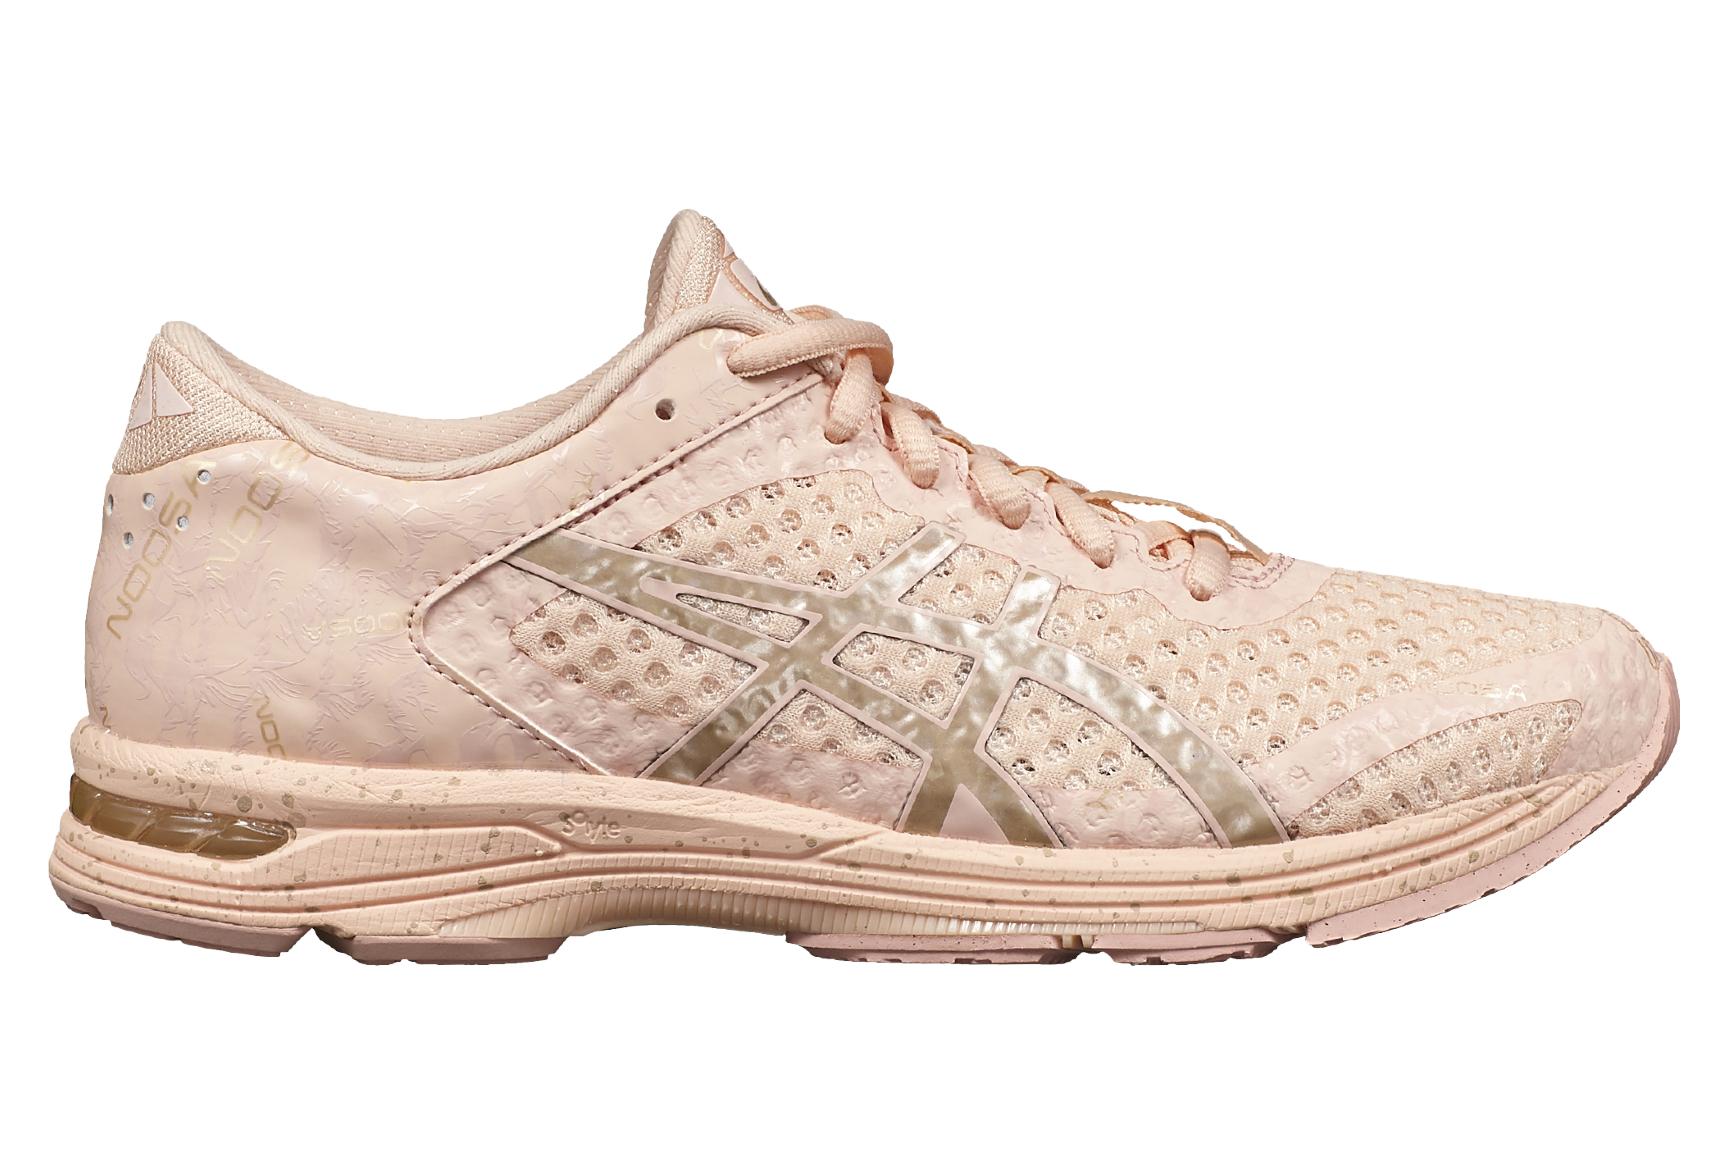 meilleure sélection 56a31 b42bd Chaussures femme Asics Gel-noosa tri 11